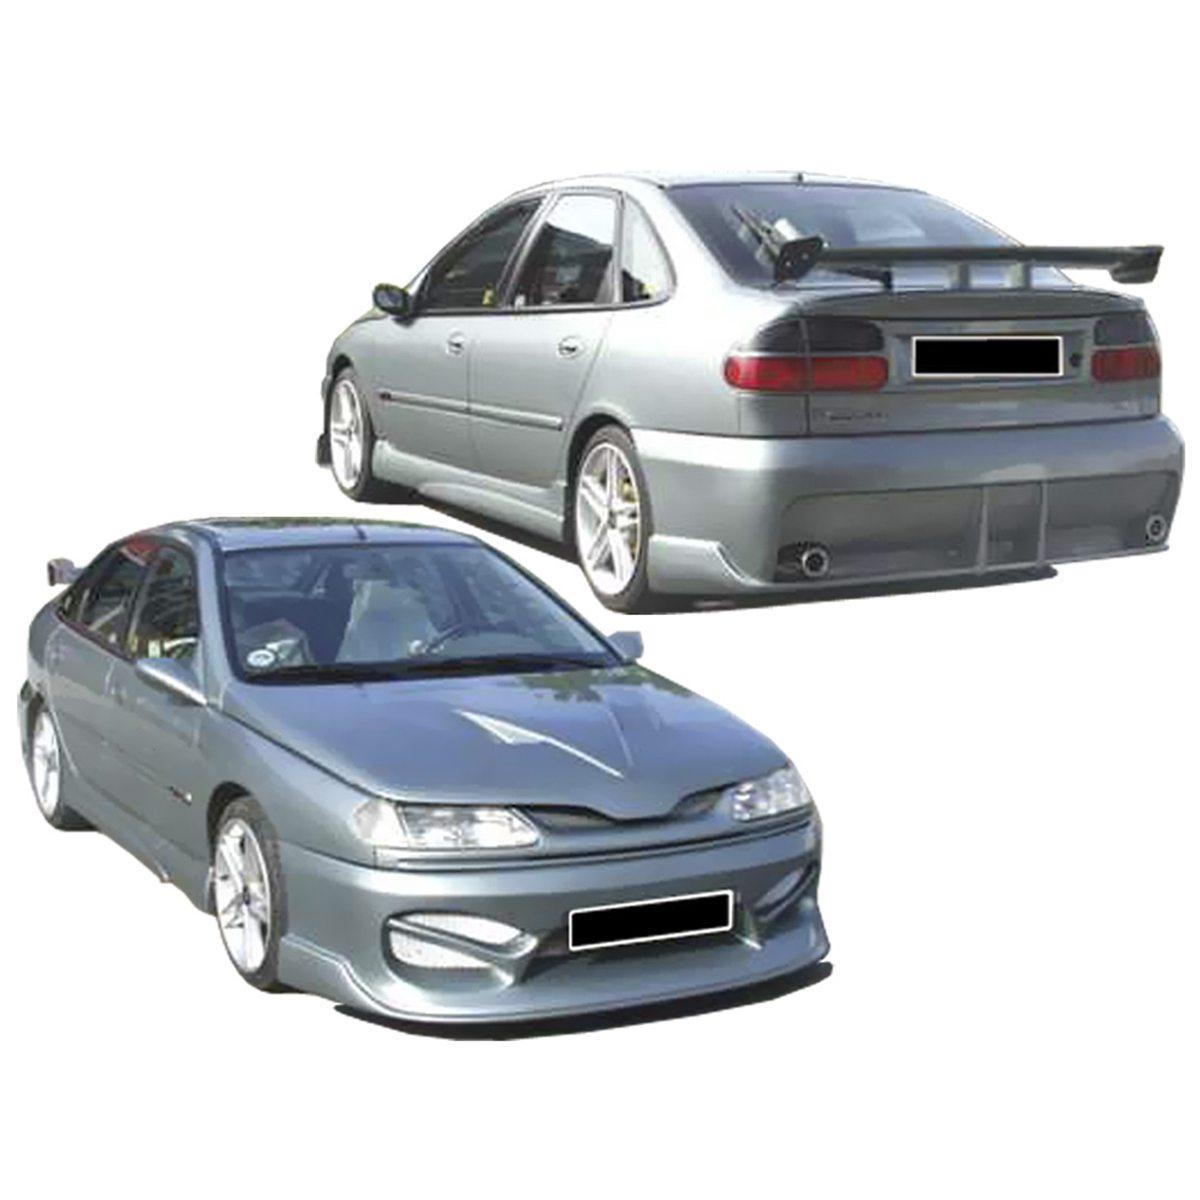 Renault-Laguna-Sioux-KIT-KTN024